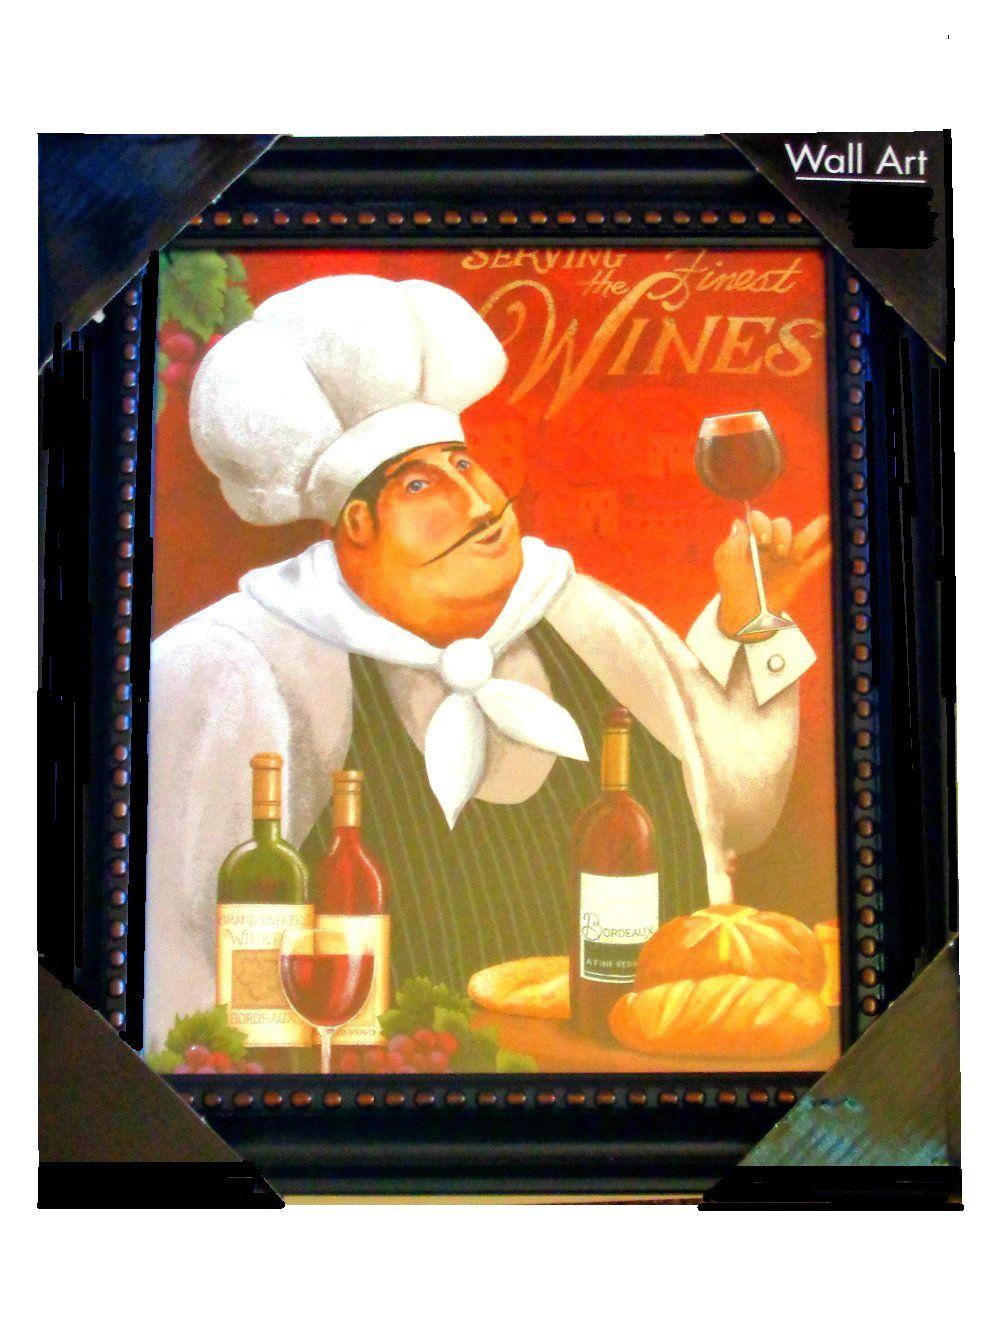 Fat French Chef Wine Kitchen Wall Art Framed Print 21 95 Fat Chefs Kitchen Decor Pinterest